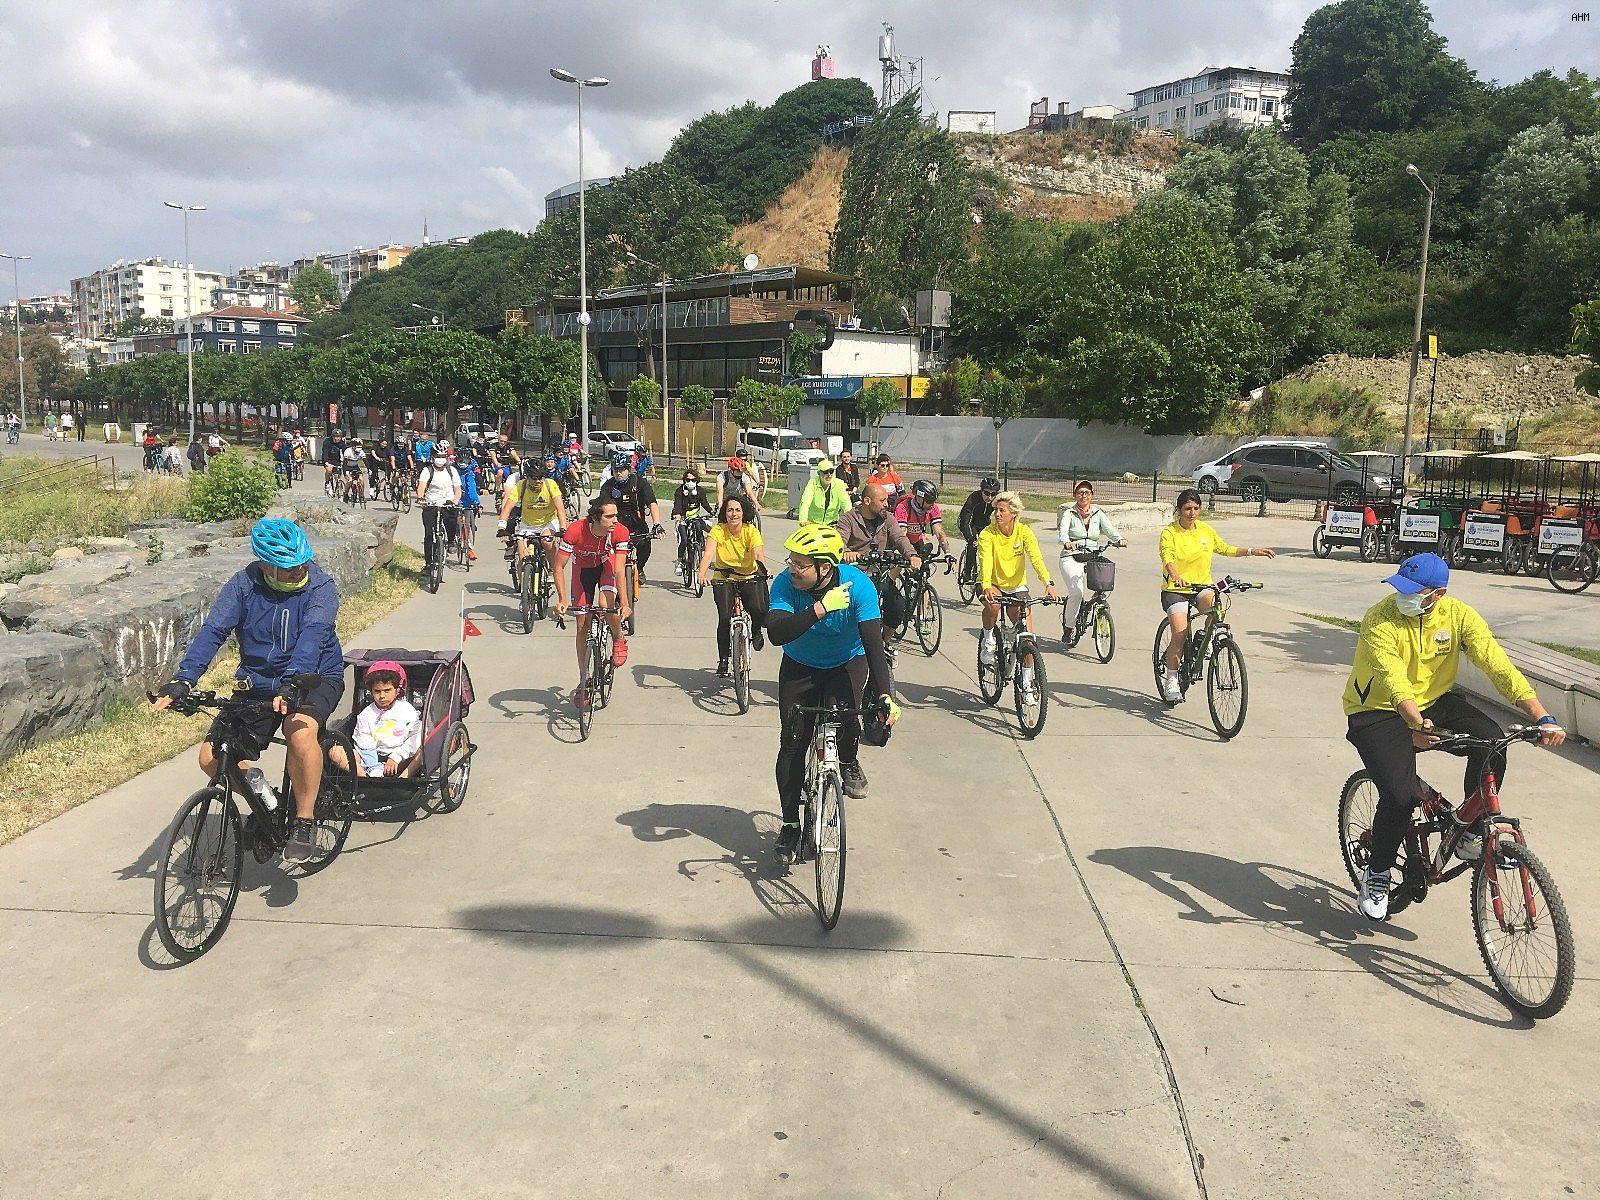 2021/06/avcilarda-bisikletseverler-dunya-bisiklet-gunu-icin-pedal-cevirdi-20210603AW33-5.jpg